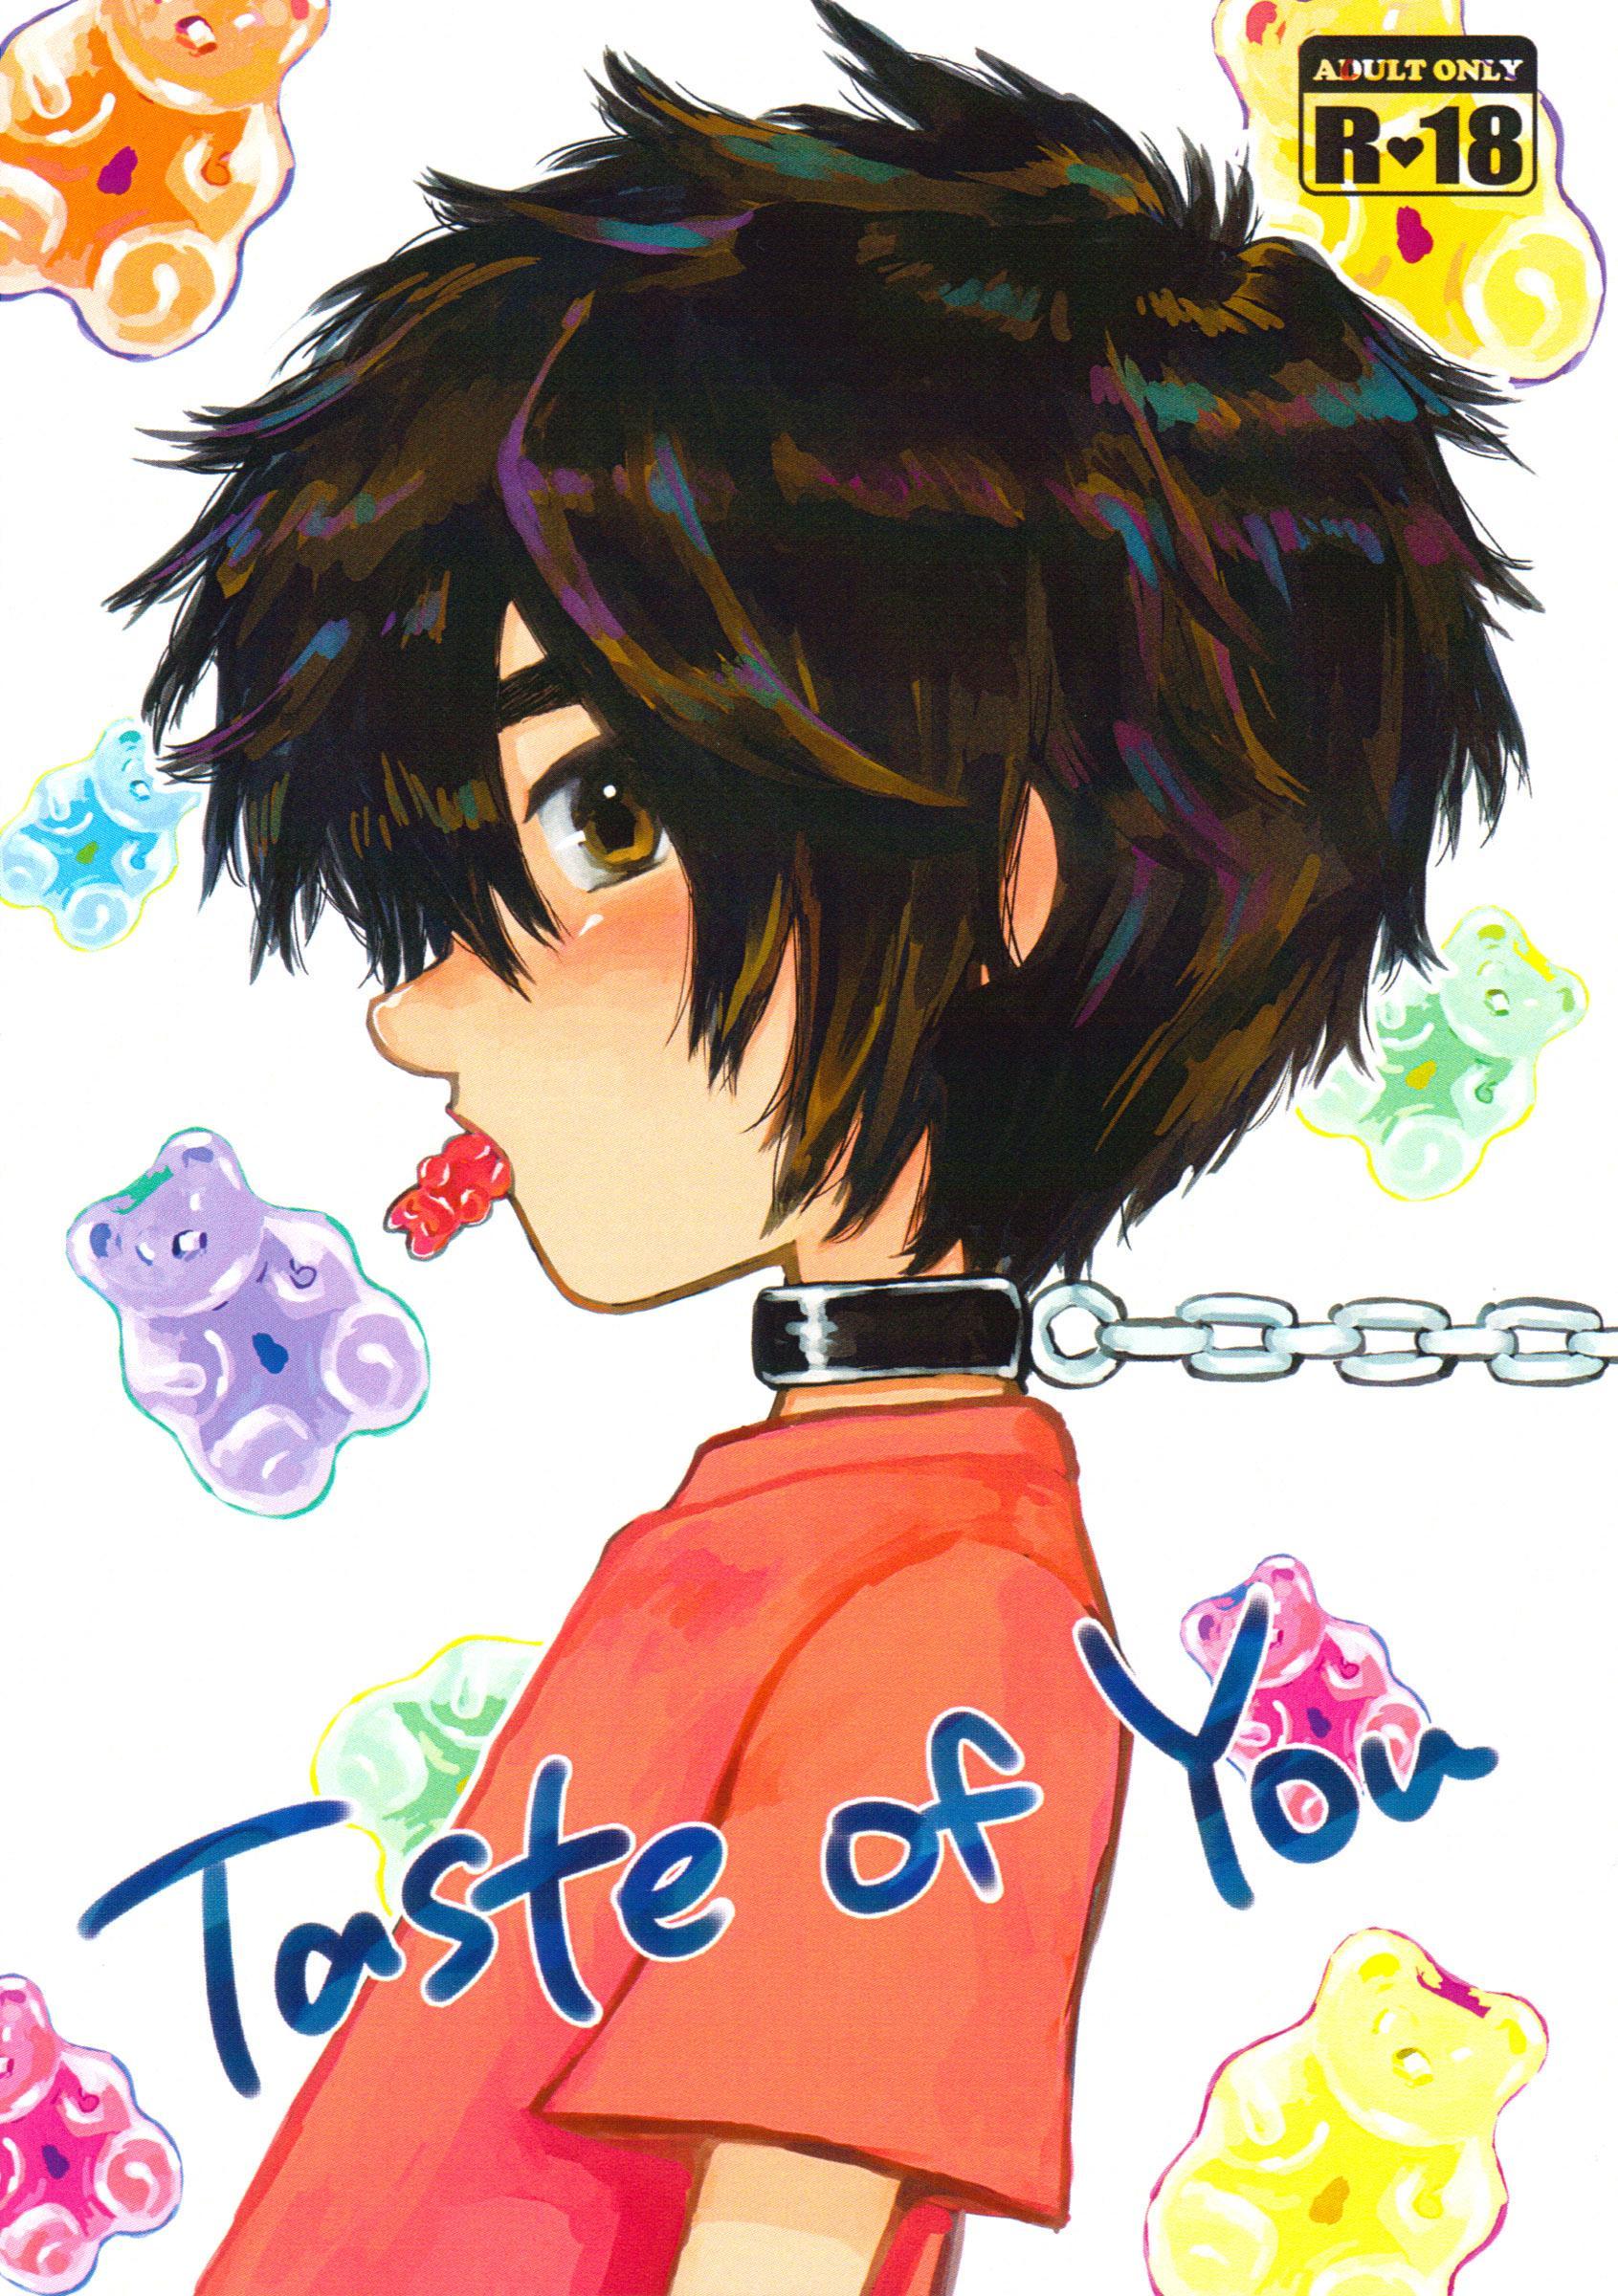 Taste of You 1